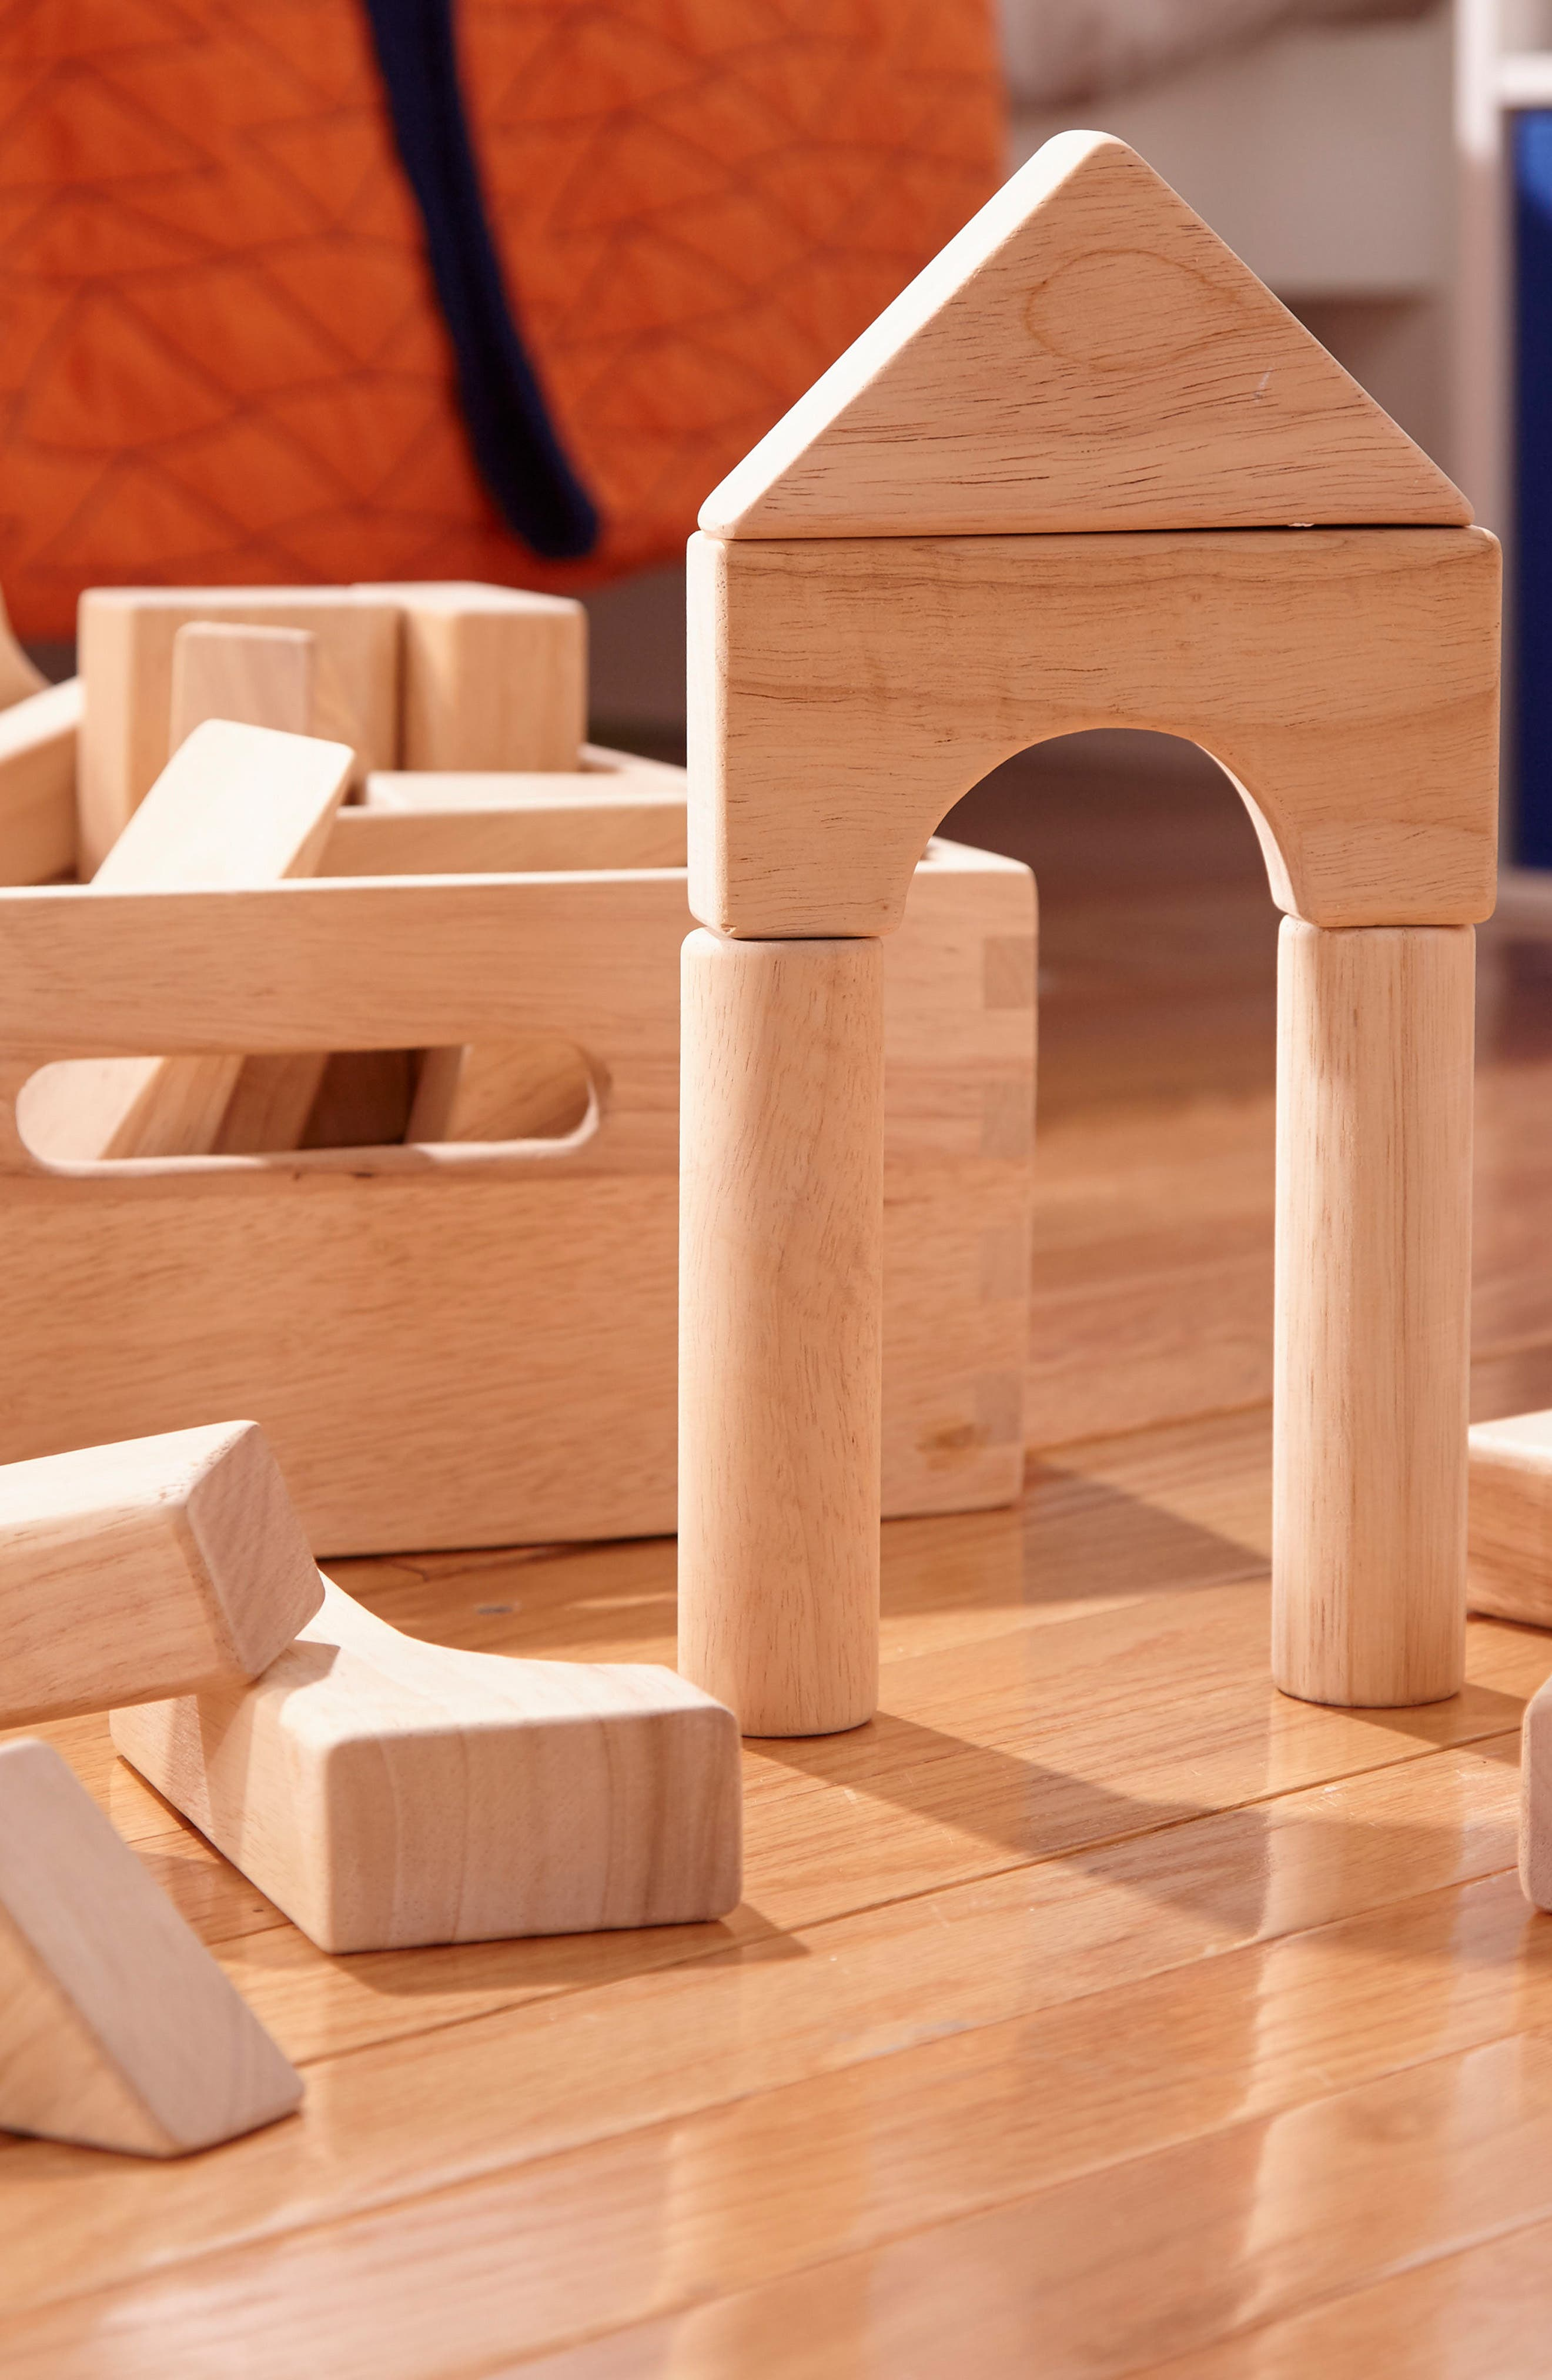 'Standard Unit' Block Play Set,                             Alternate thumbnail 4, color,                             960